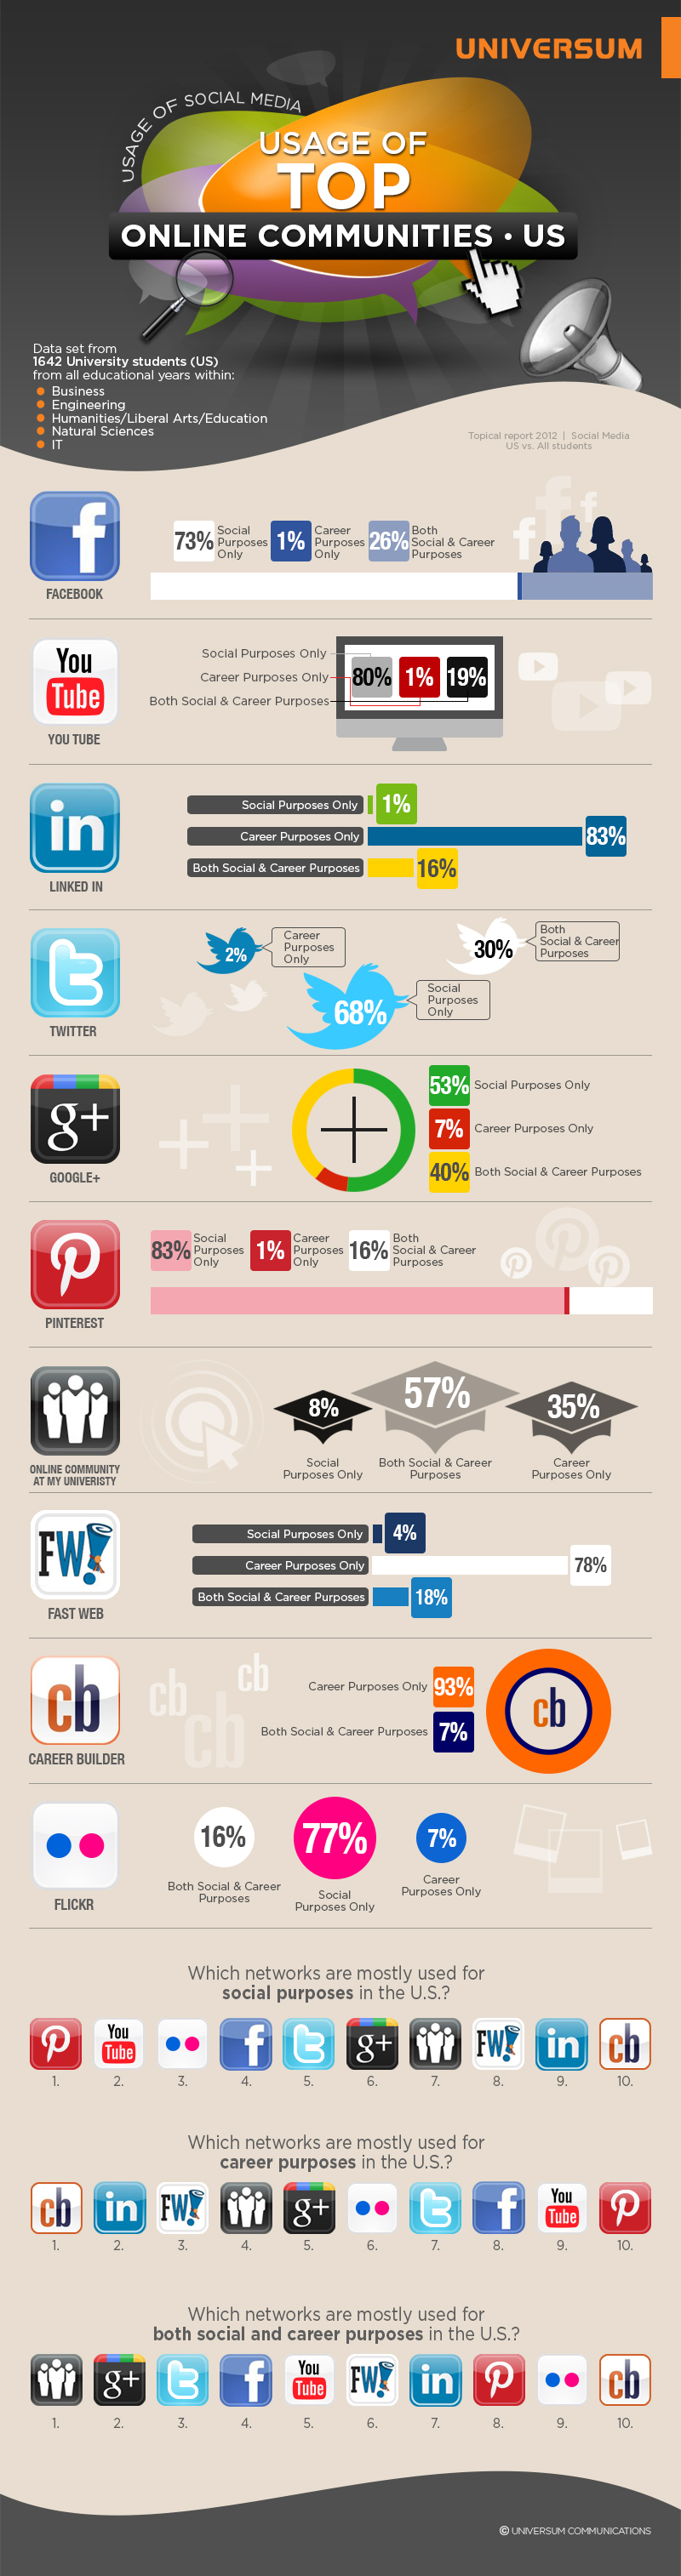 Social Platforms Us University Students Use For Careers Purposes Infographic Via Universum Eb Employe Social Media Infographic Infographic Social Media Tool